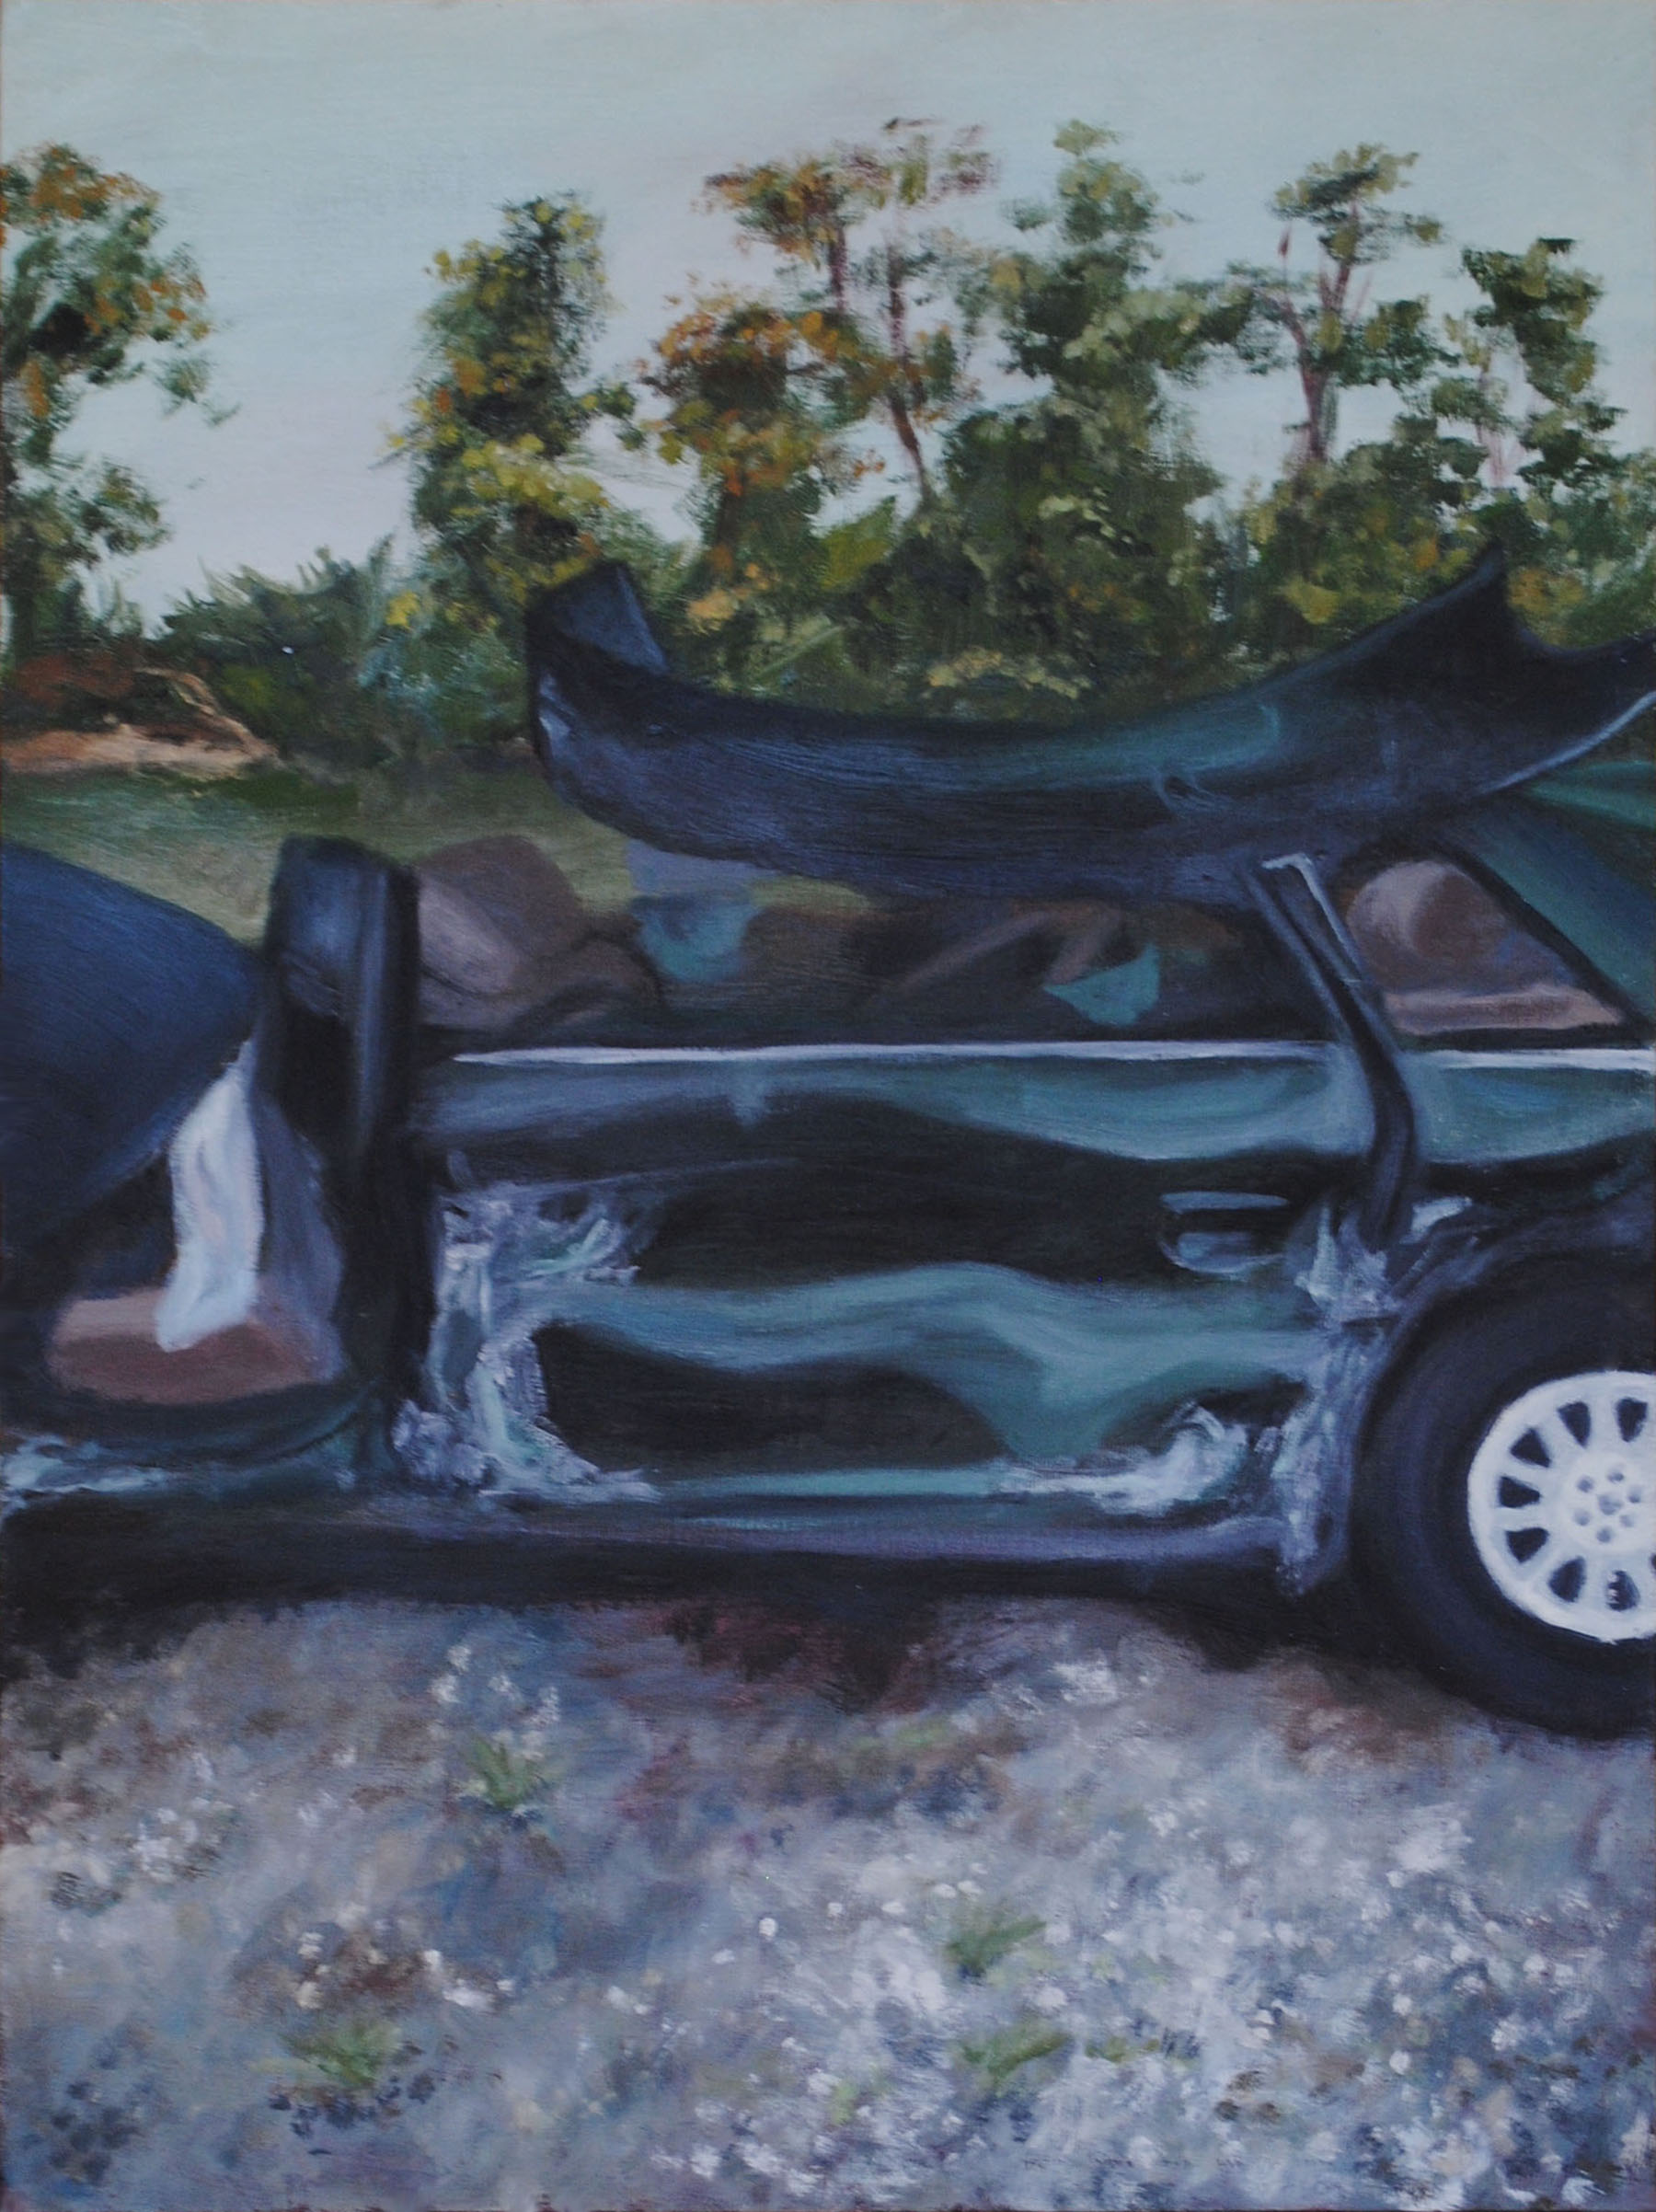 """Crash part 2"" by Emily Urban"